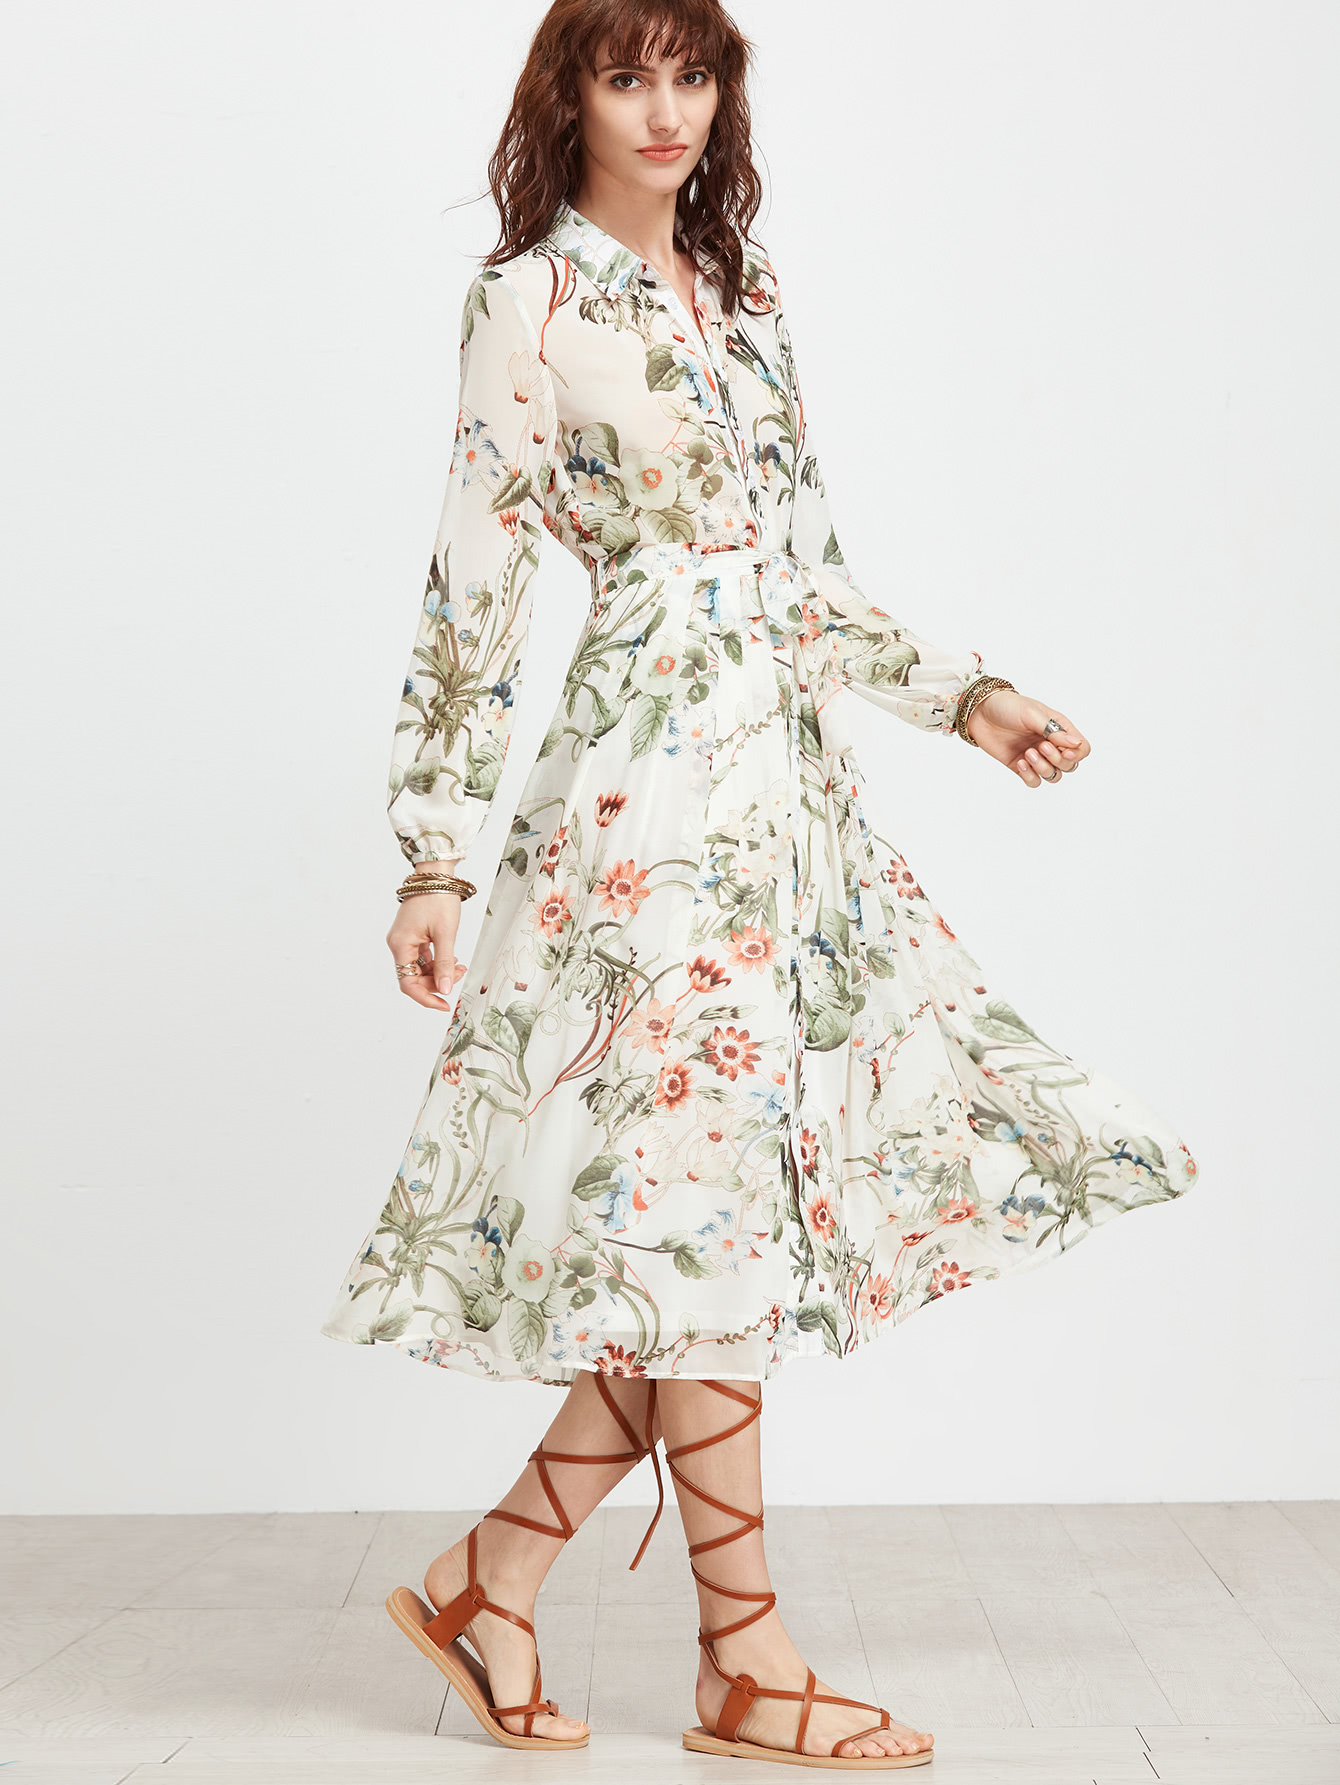 a7f0c1df5f Calico Print Shirt Dress With Self Tie -SheIn(Sheinside)